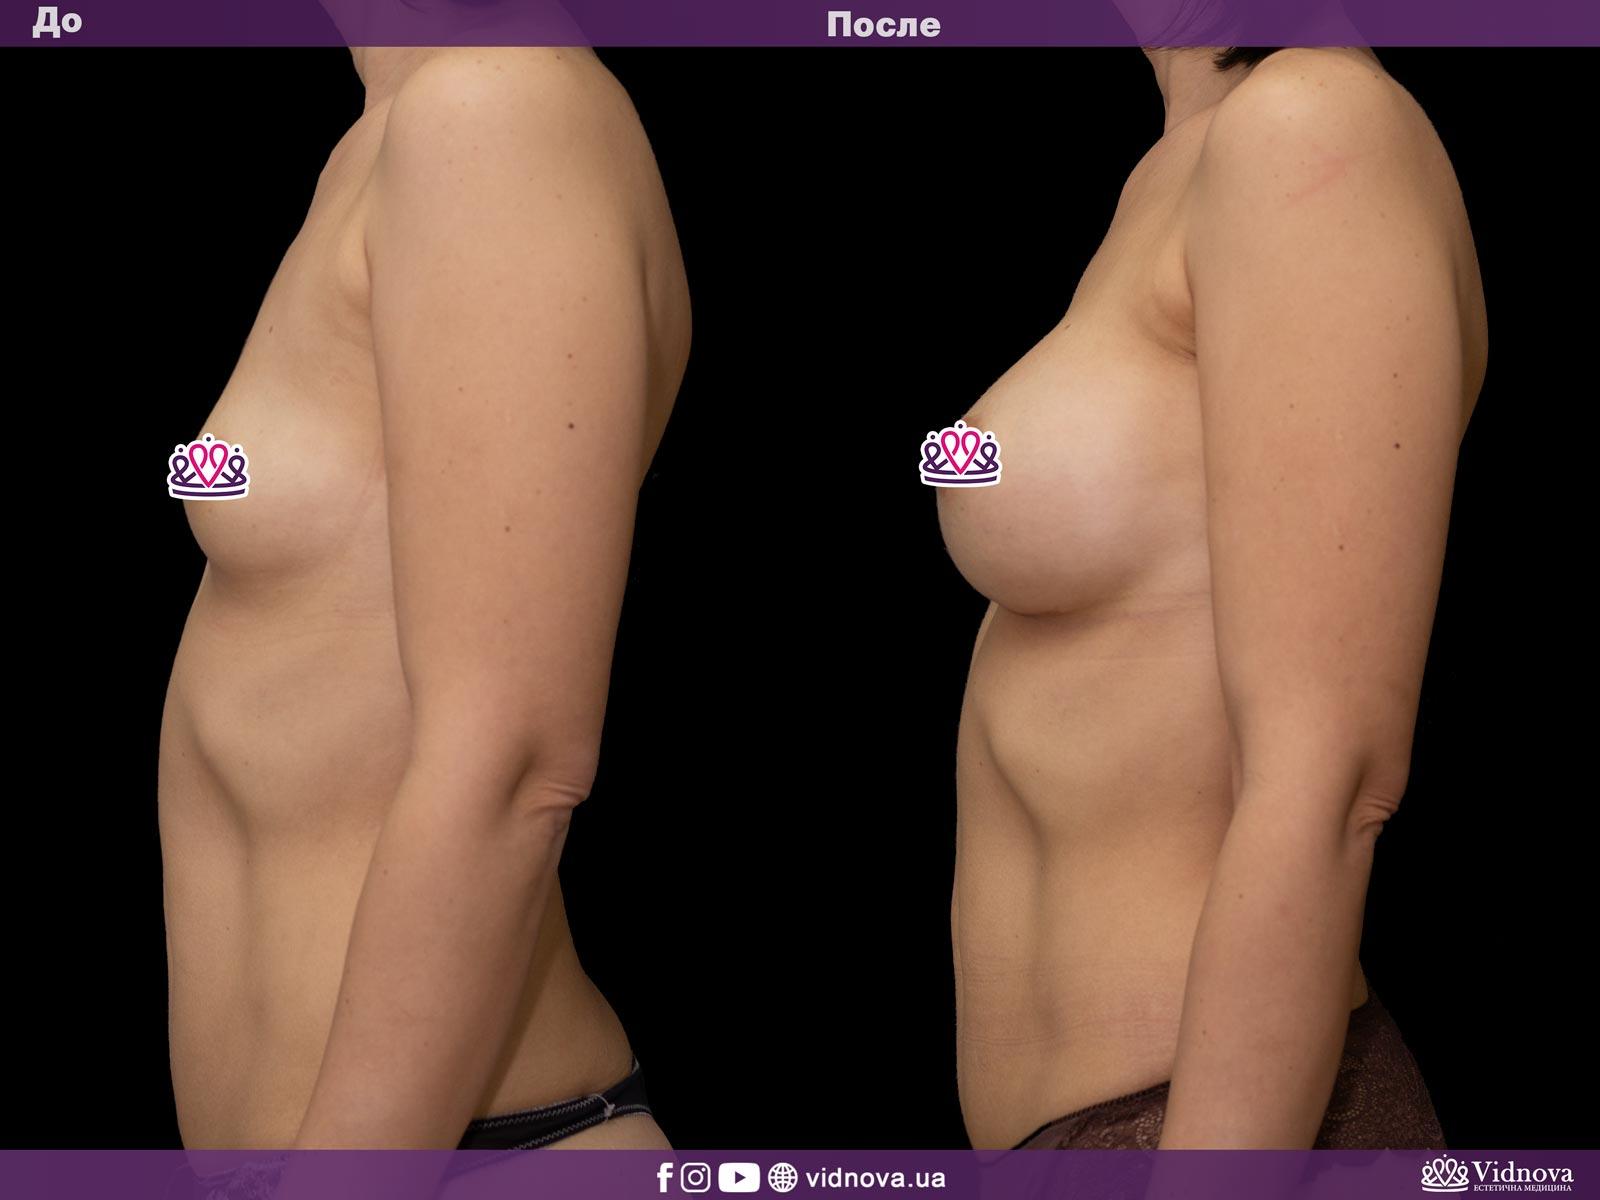 Увеличение груди: Фото ДО и ПОСЛЕ - Пример №15-3 - Клиника Vidnova